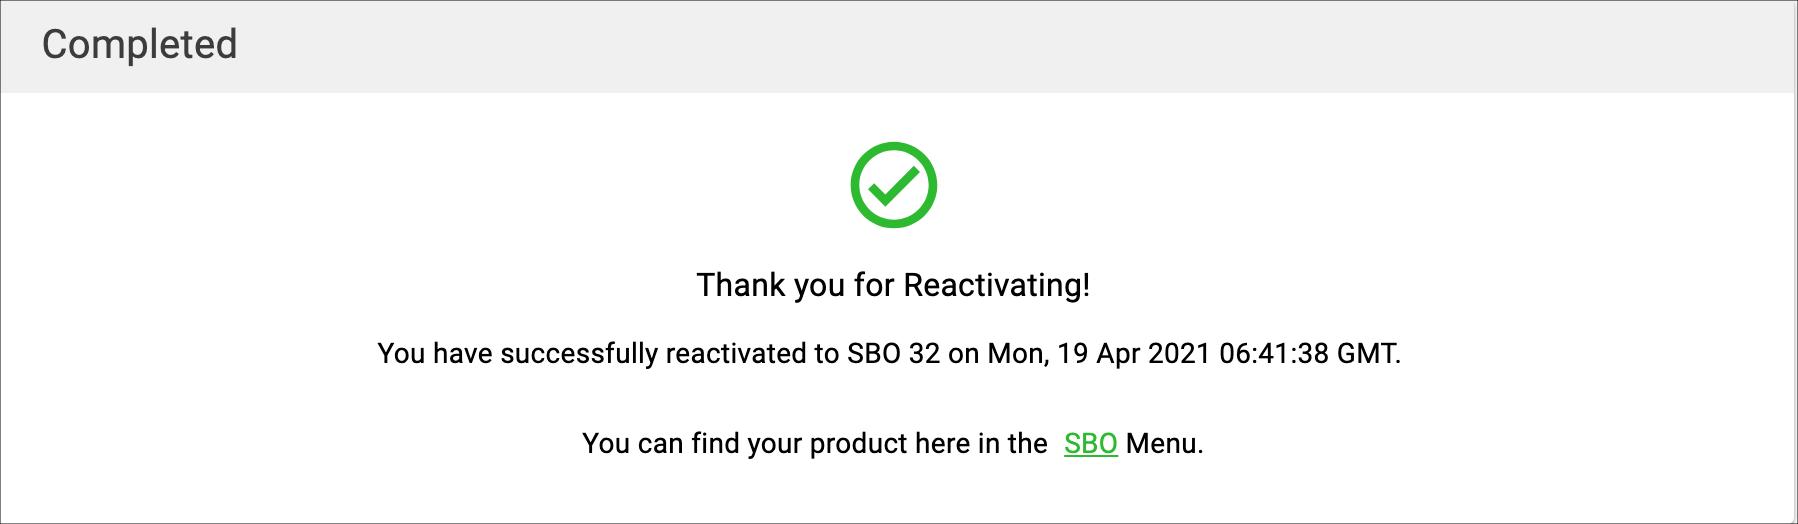 SBO Reactivation Process 10